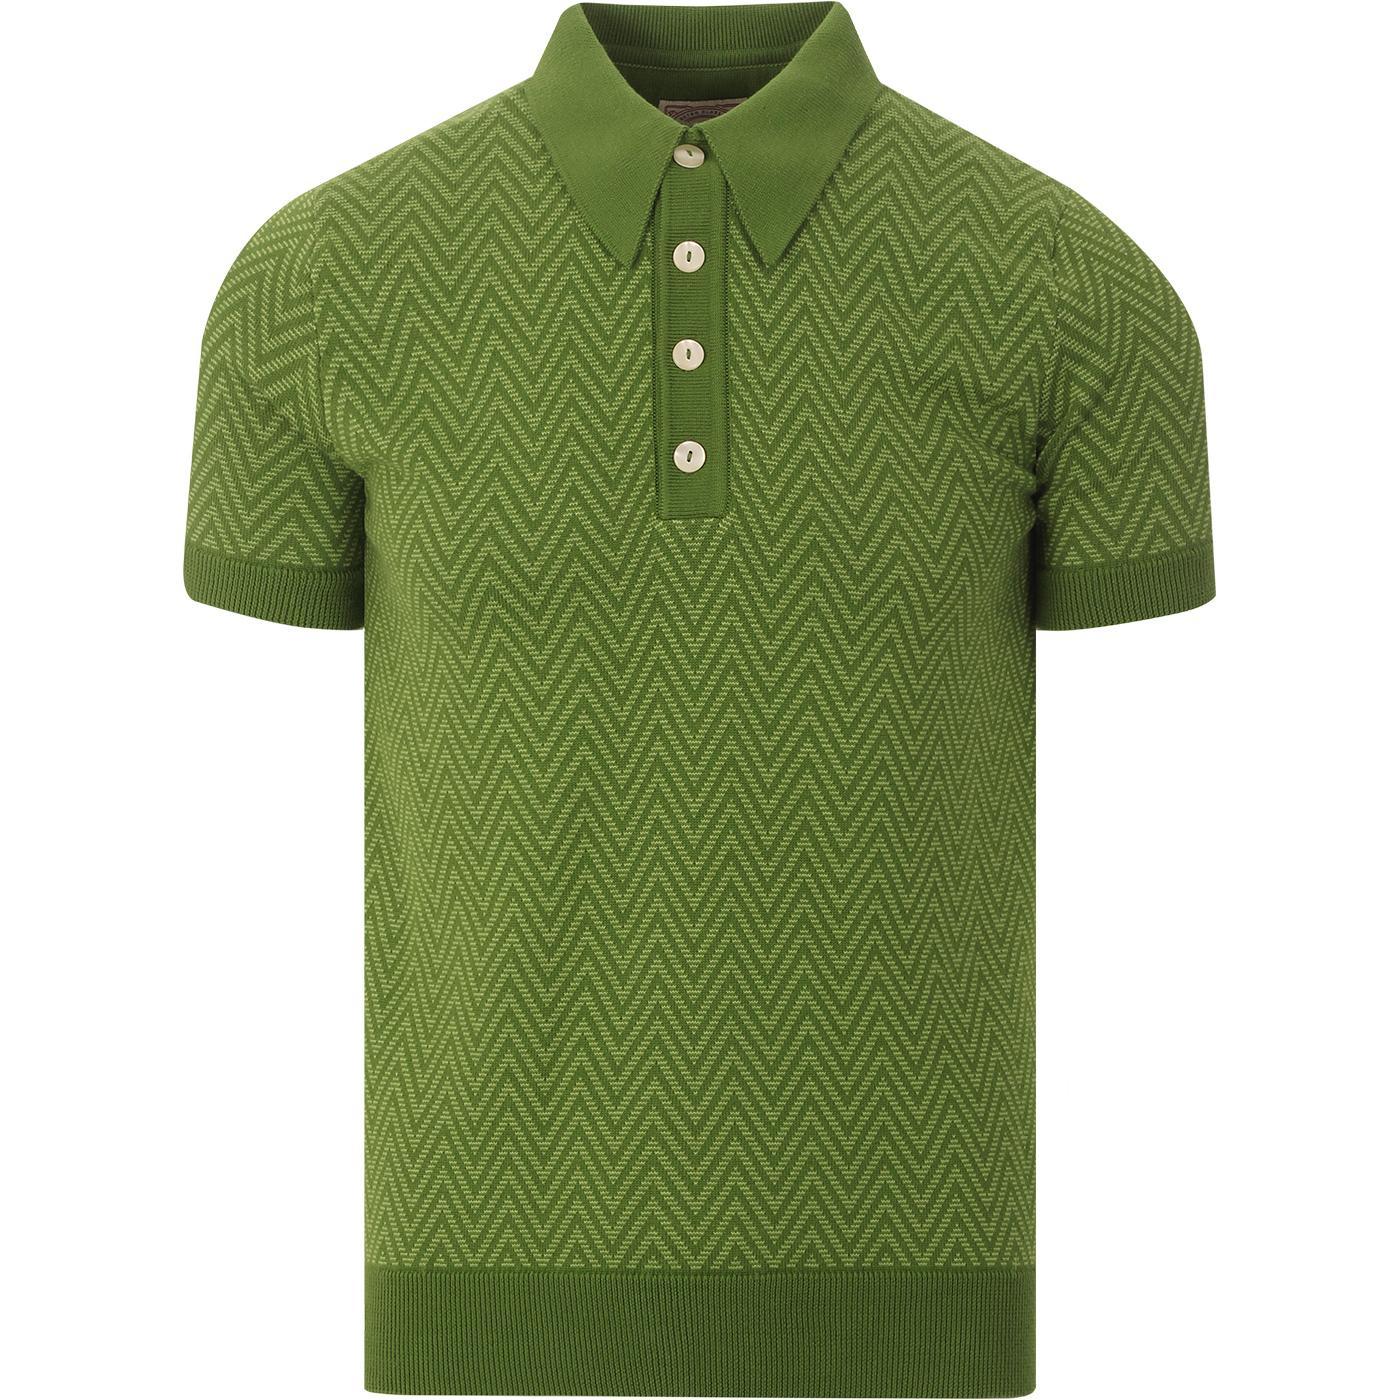 SKA & SOUL Mod Herringbone Knit Polo Shirt (Green)